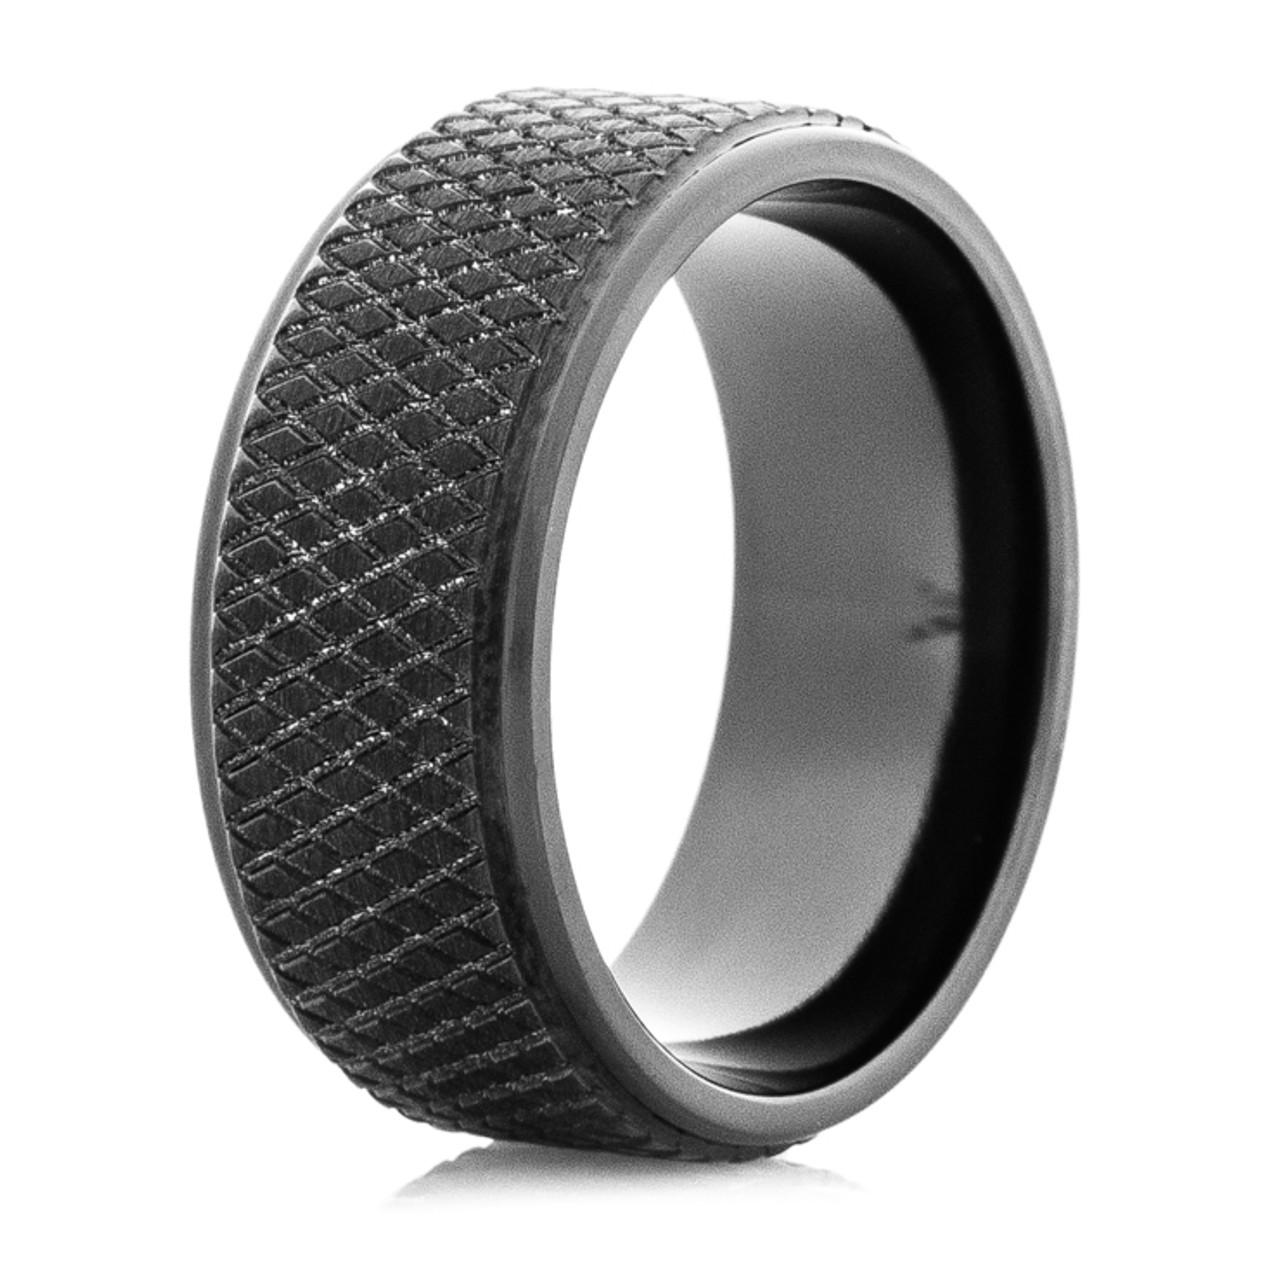 Men's Zirconium Ring Black Hockey Puck zVqSLMUpG